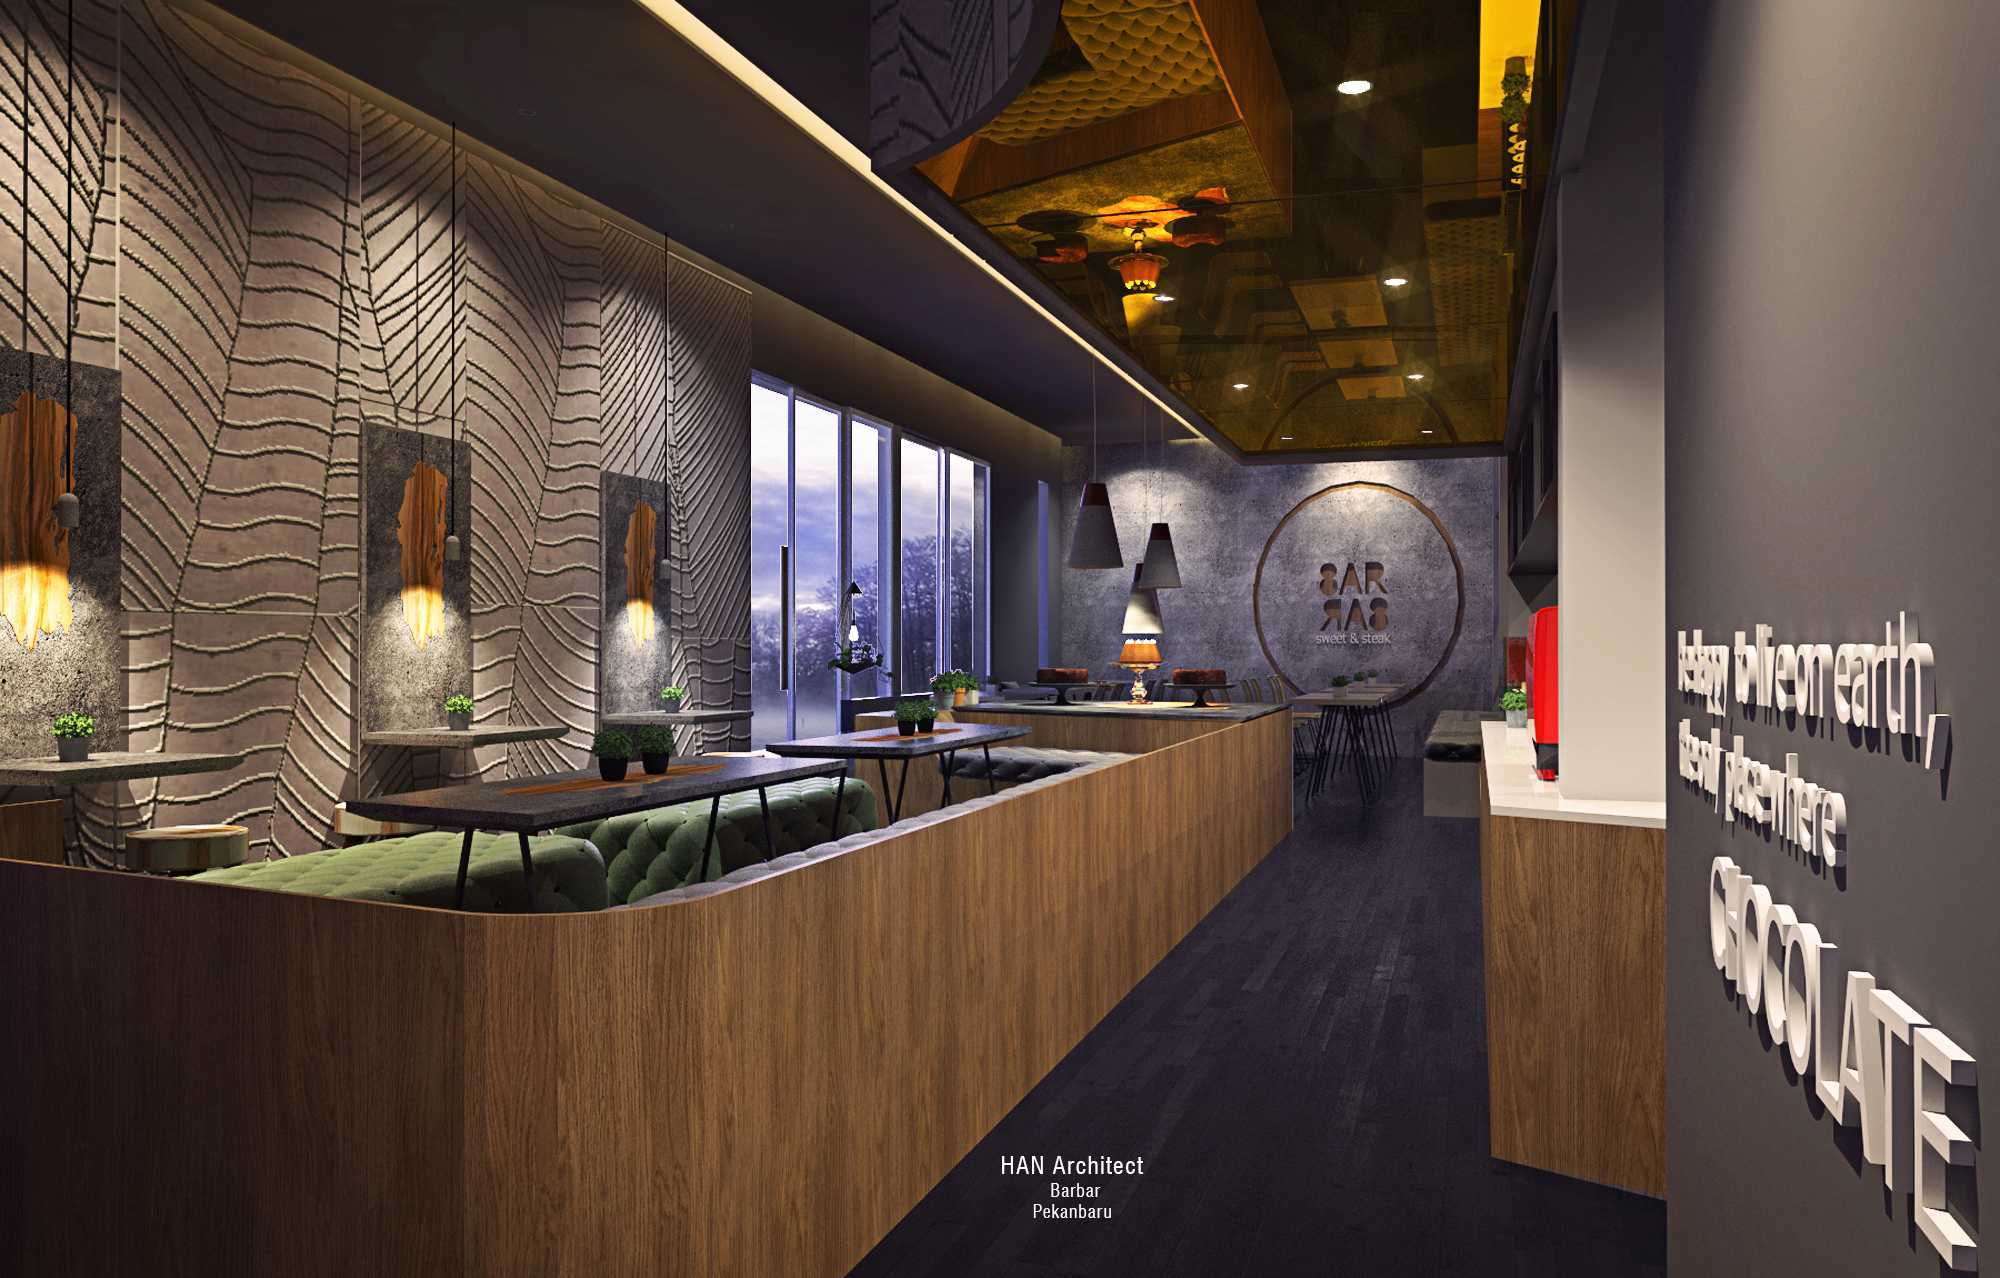 Han Architect Barbar Steak & Sweet Pekanbaru Pekanbaru Revisi-2Jpg   28849